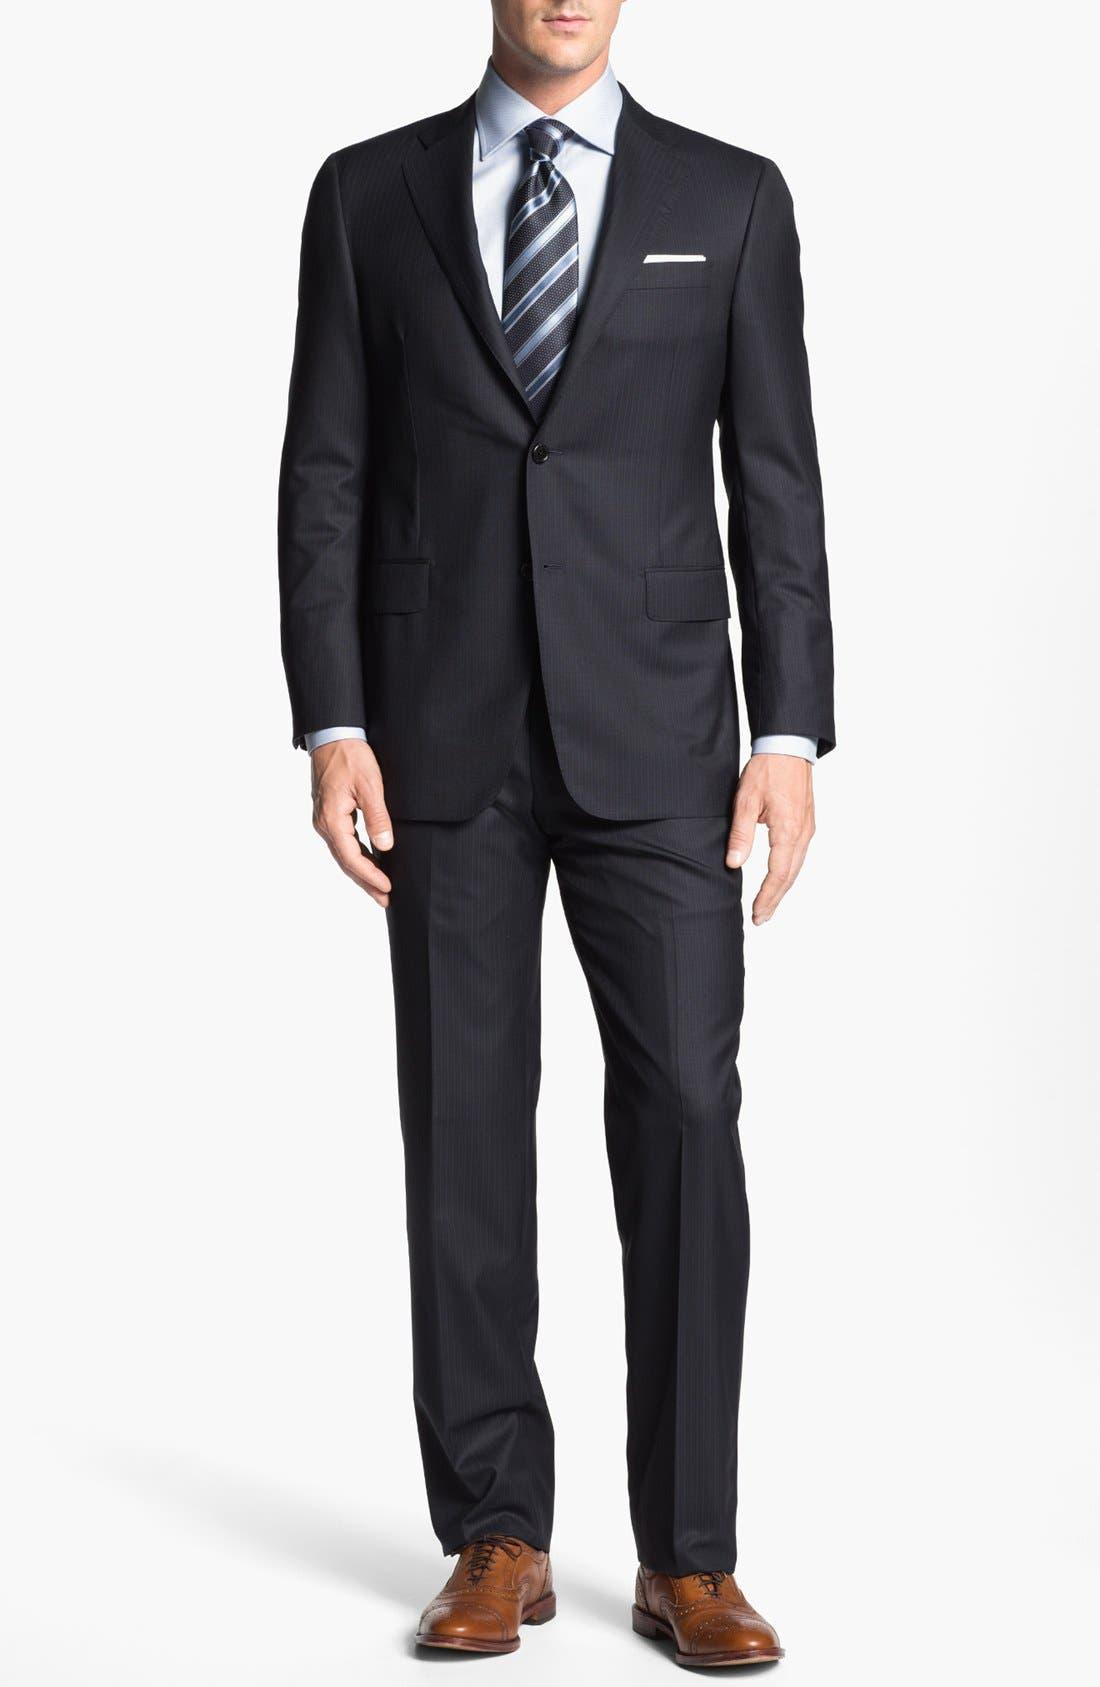 Main Image - Hickey Freeman 'Beacon' Stripe Suit